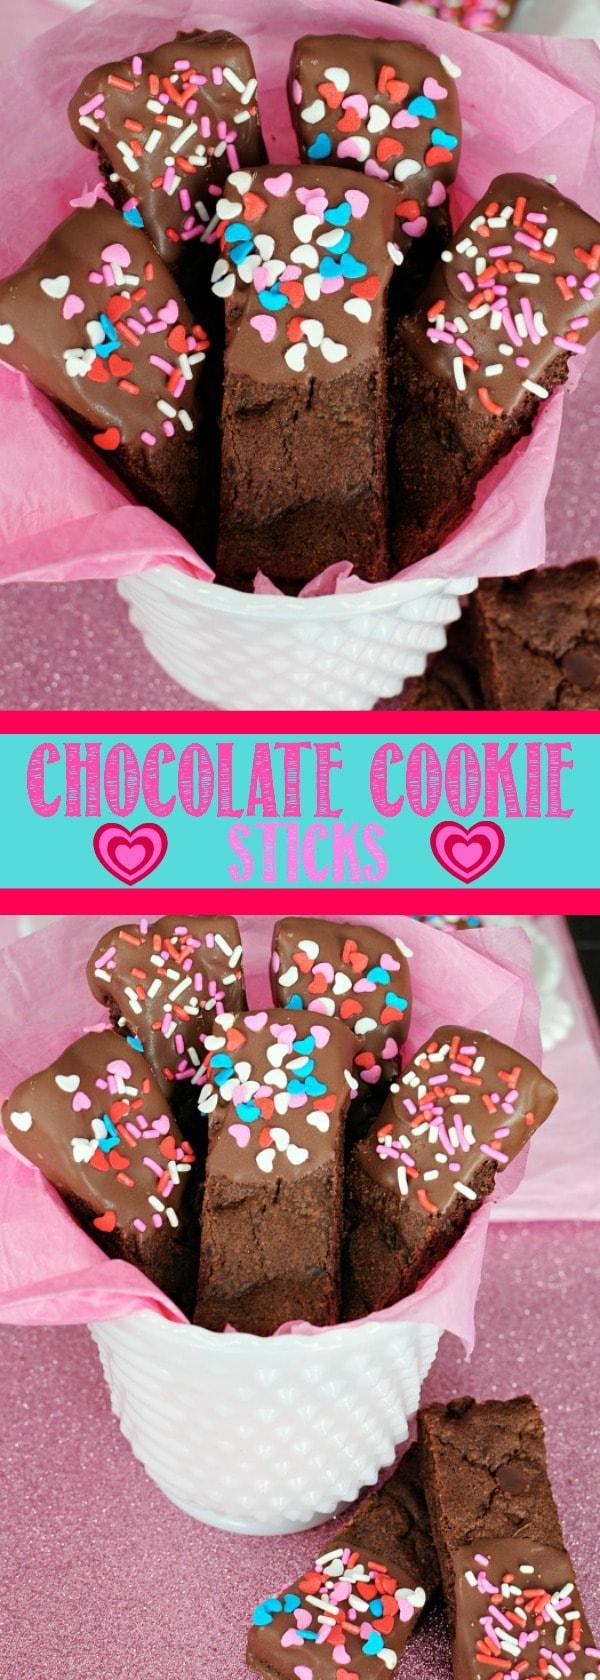 Valentine's Day Chocolate Dipped Cookie Sticks!